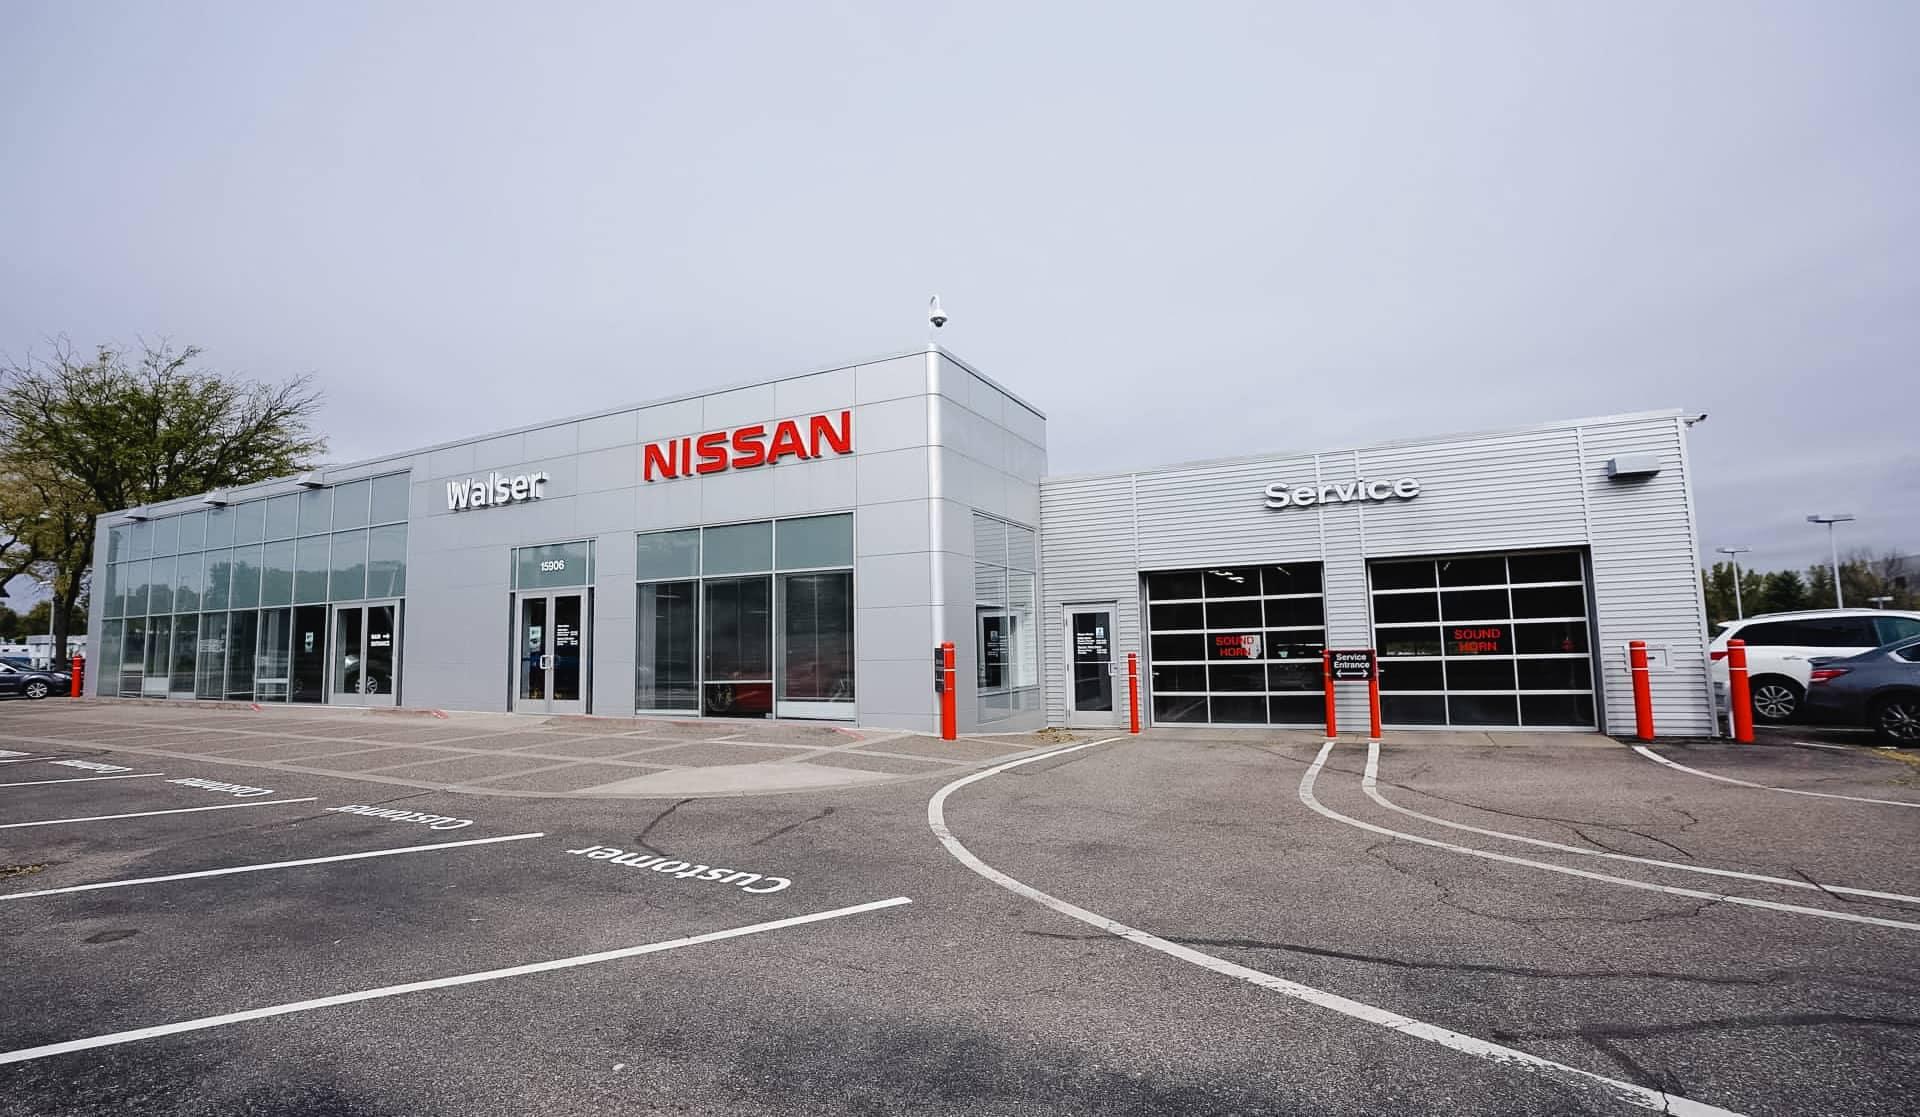 NissanWayzata